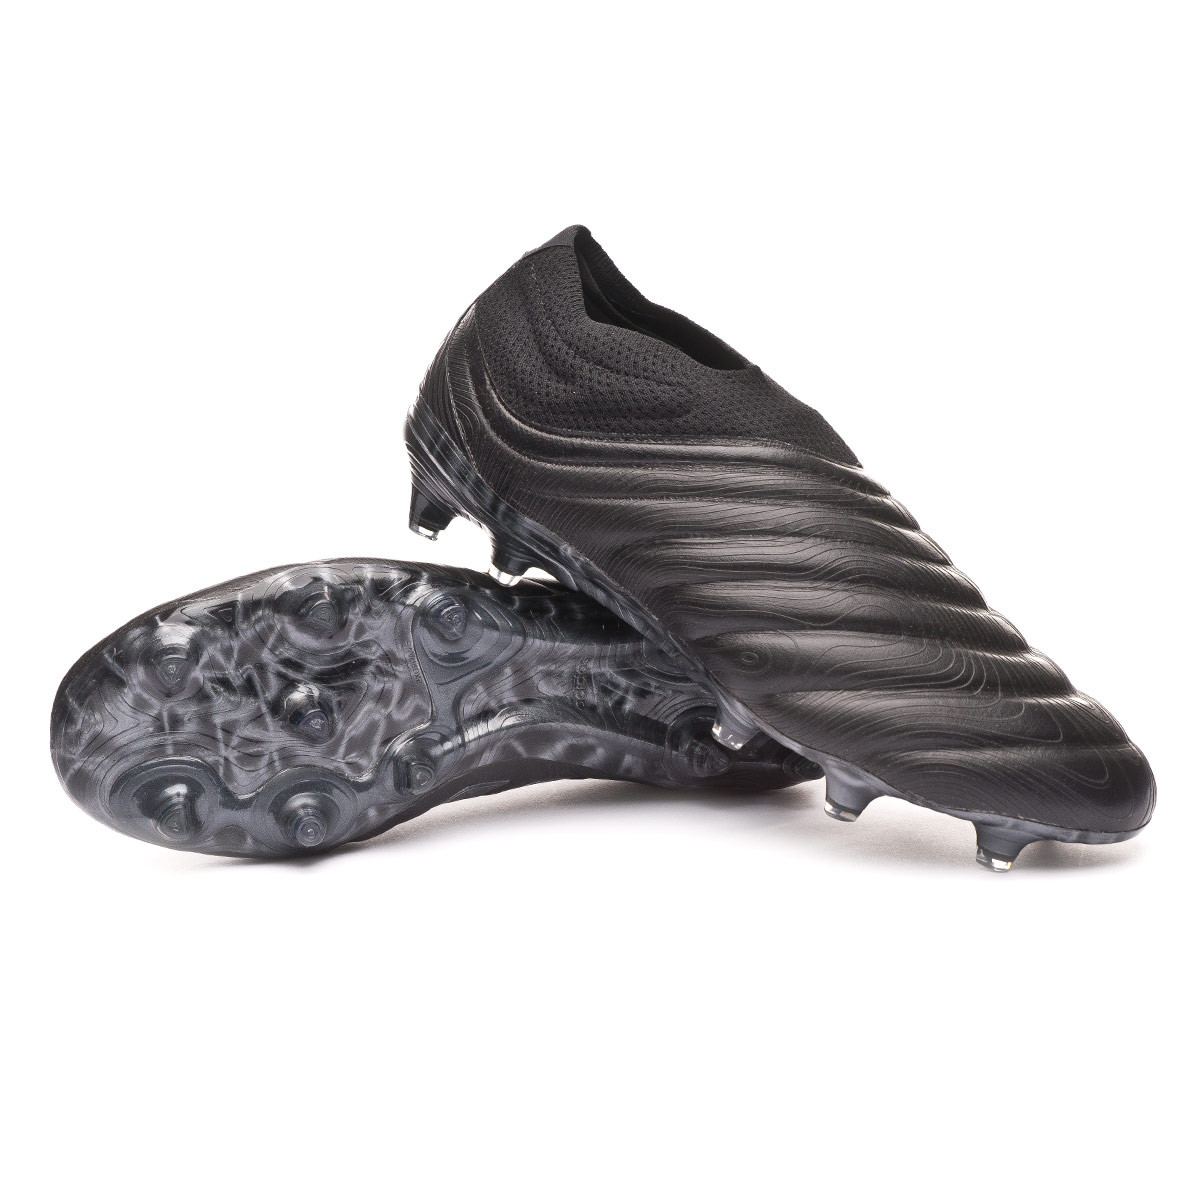 Chaussure de foot adidas Copa 20+ FG